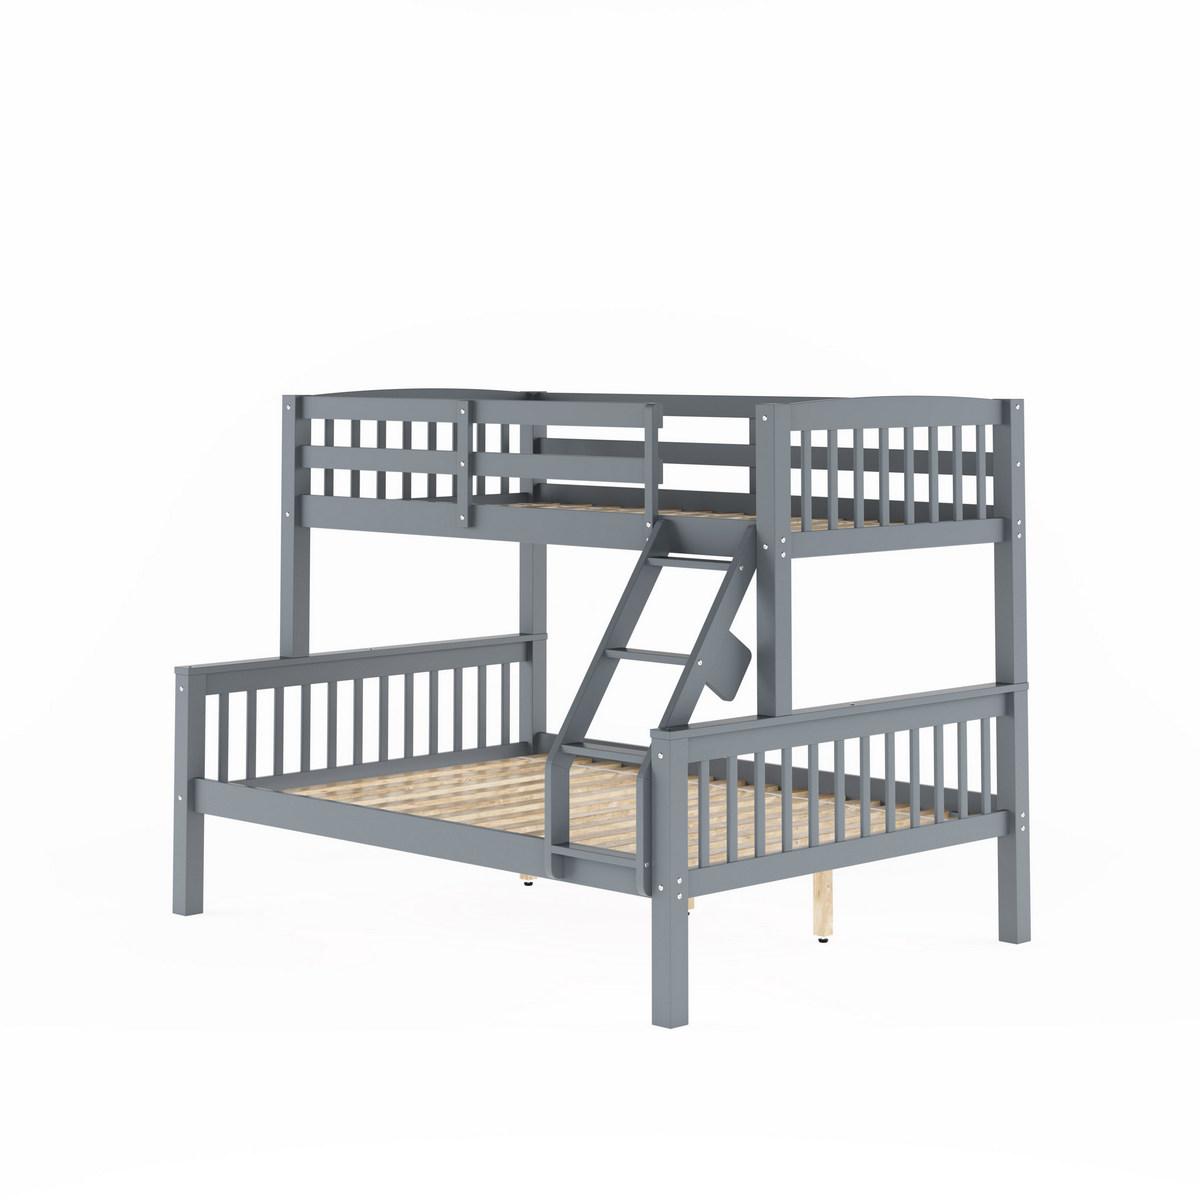 Corliving Bdn Dakota Grey Twin Single Over Full Double Bunk Bed